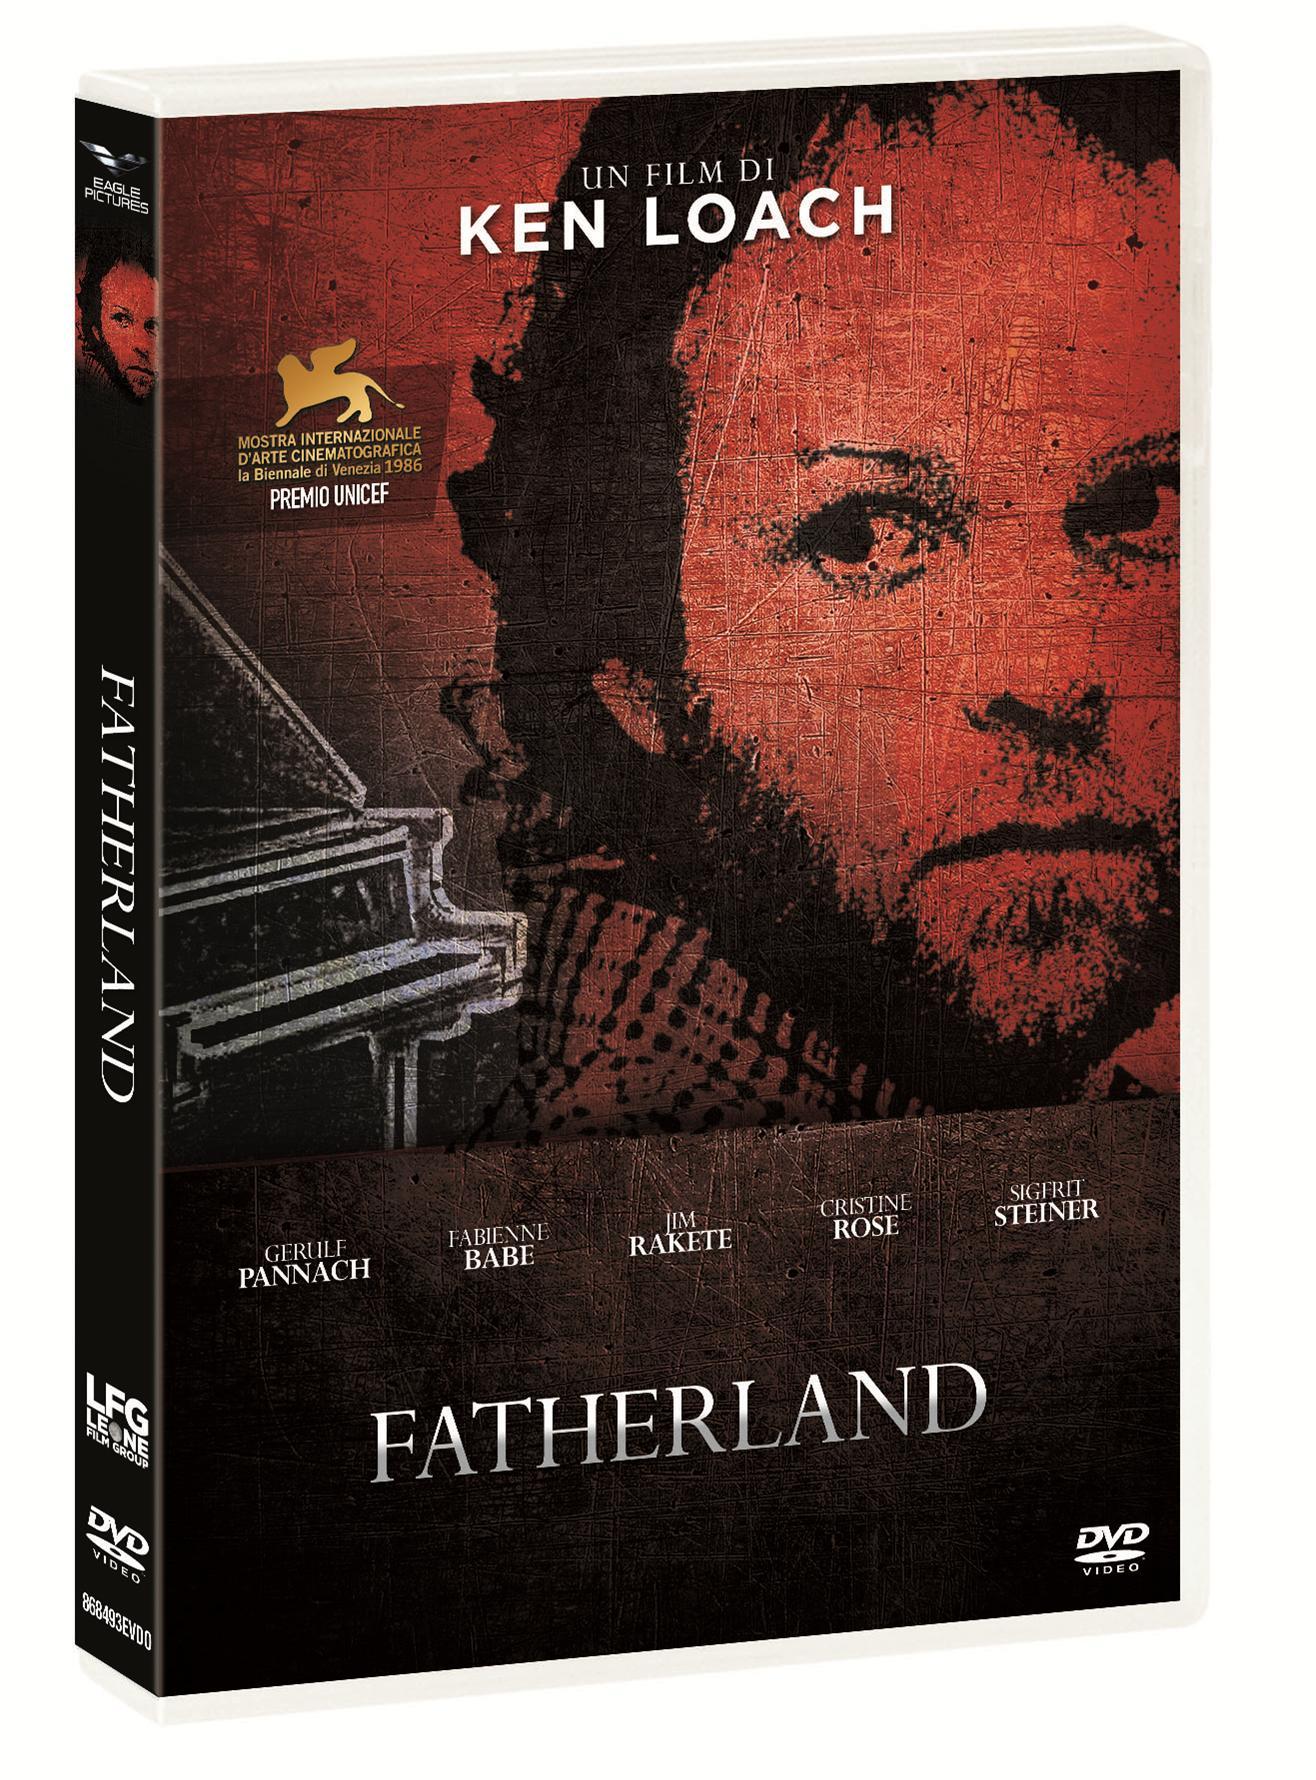 FATHERLAND (DVD)